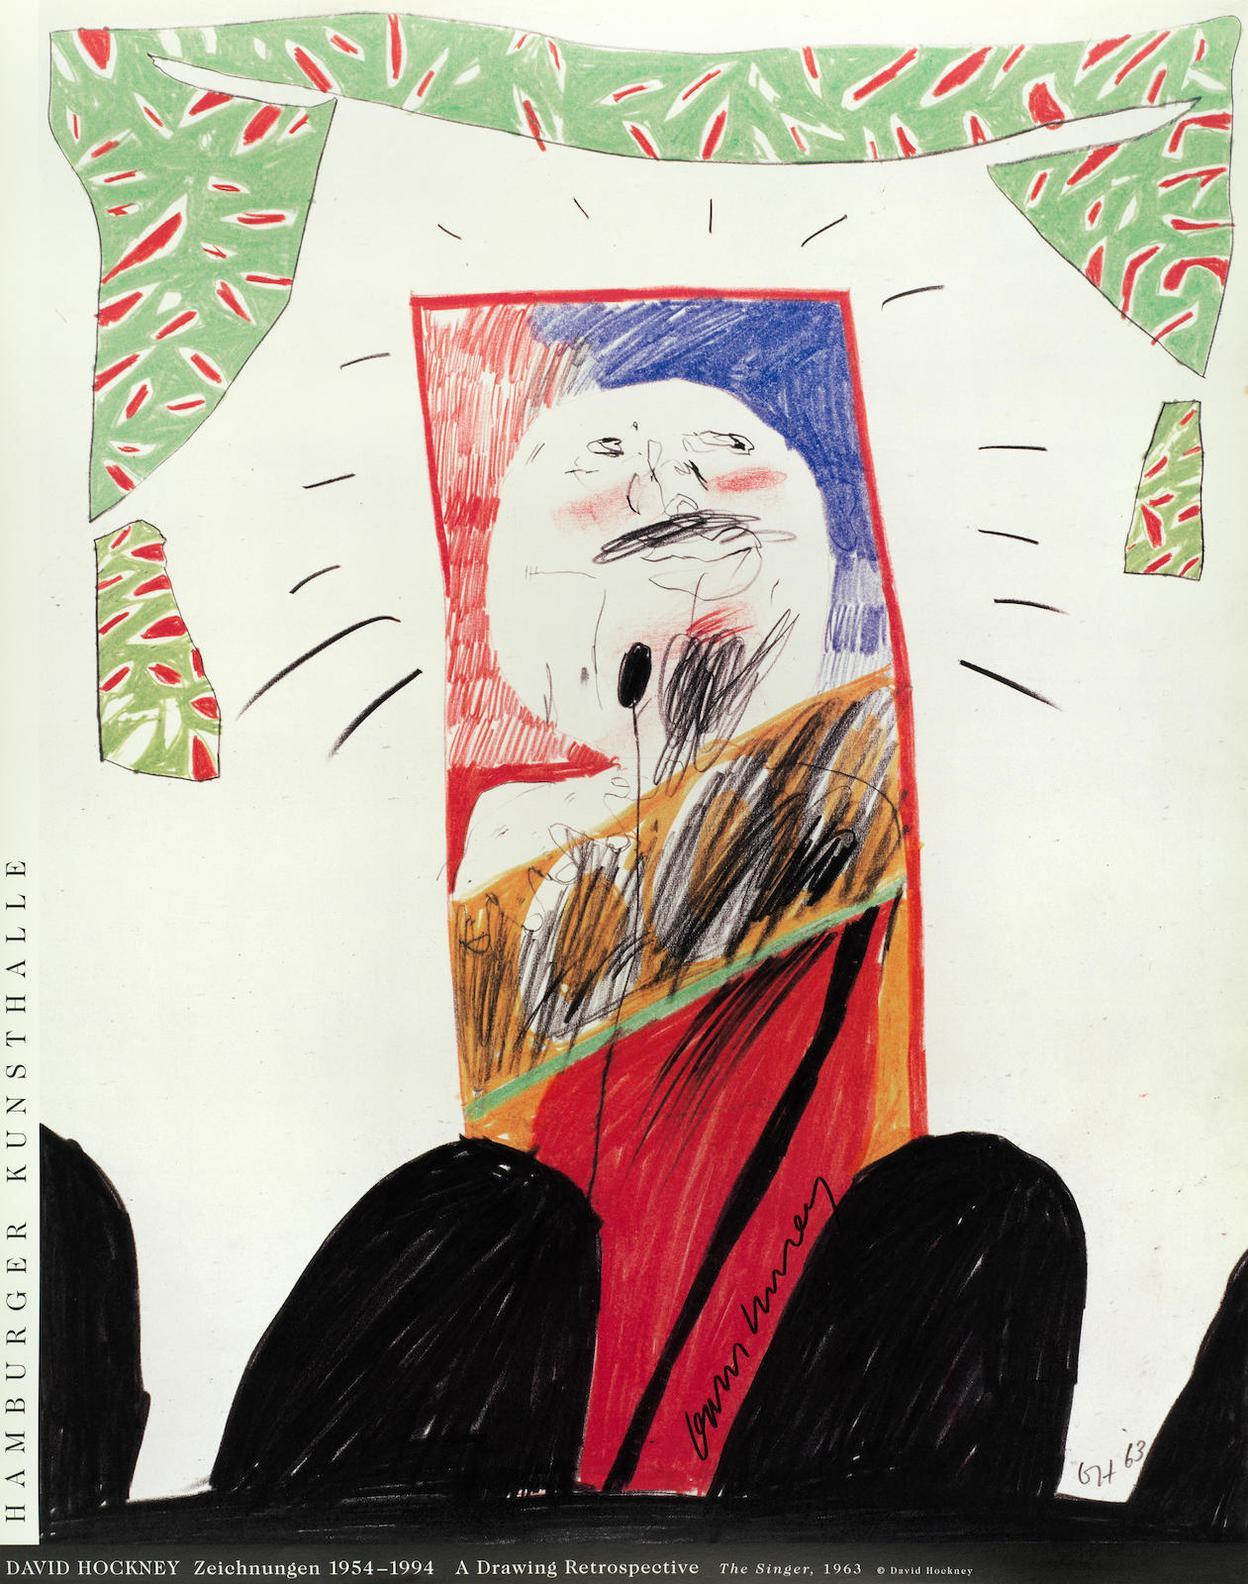 David Hockney-Hamburger Kunsthalle Exhibition Poster-1994